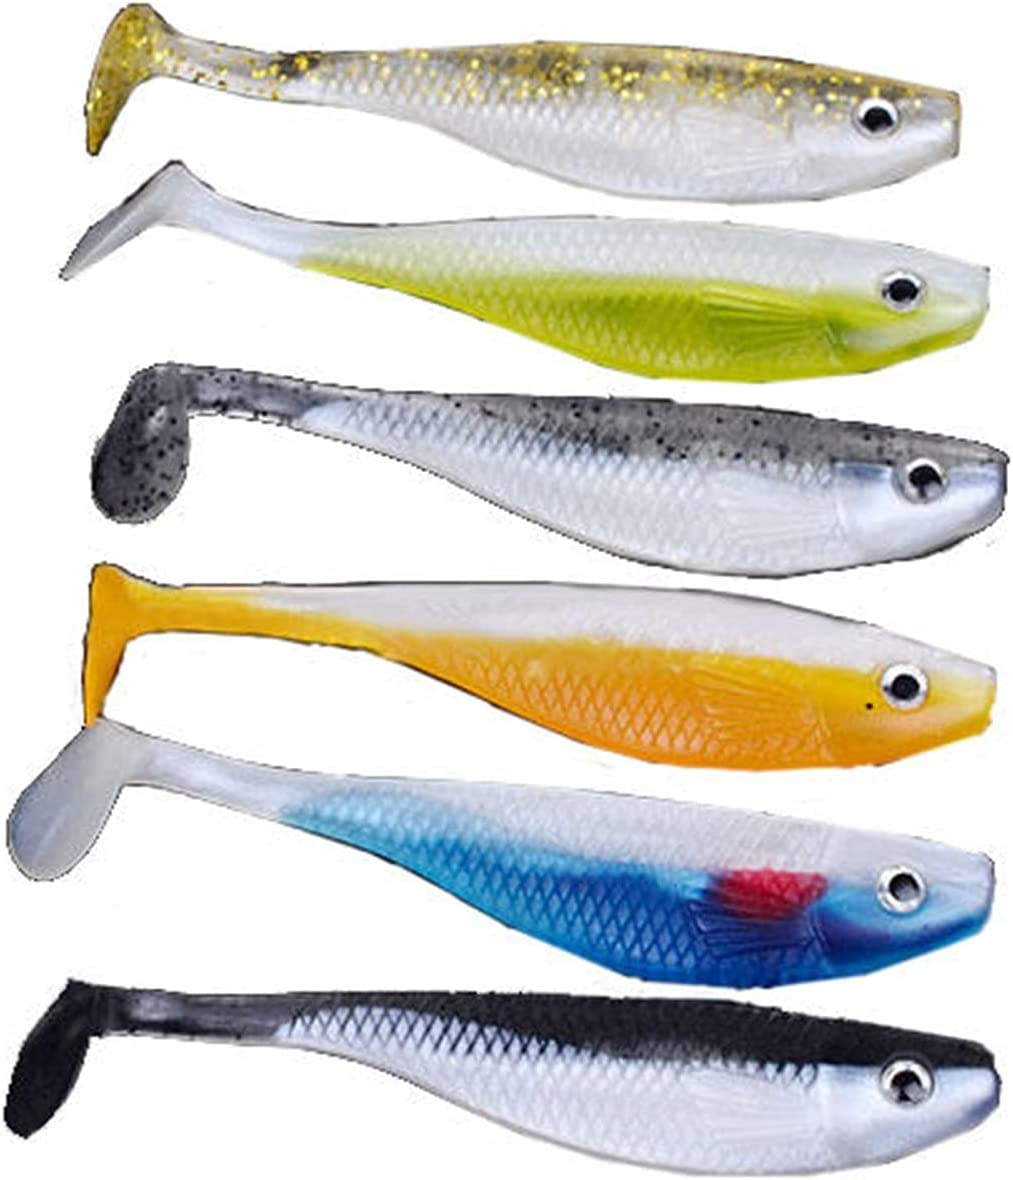 Bargain excellence XUEMEI 6PCS 11.5CM Soft Fishing Lure Bait Tail Jig Bass Rattle